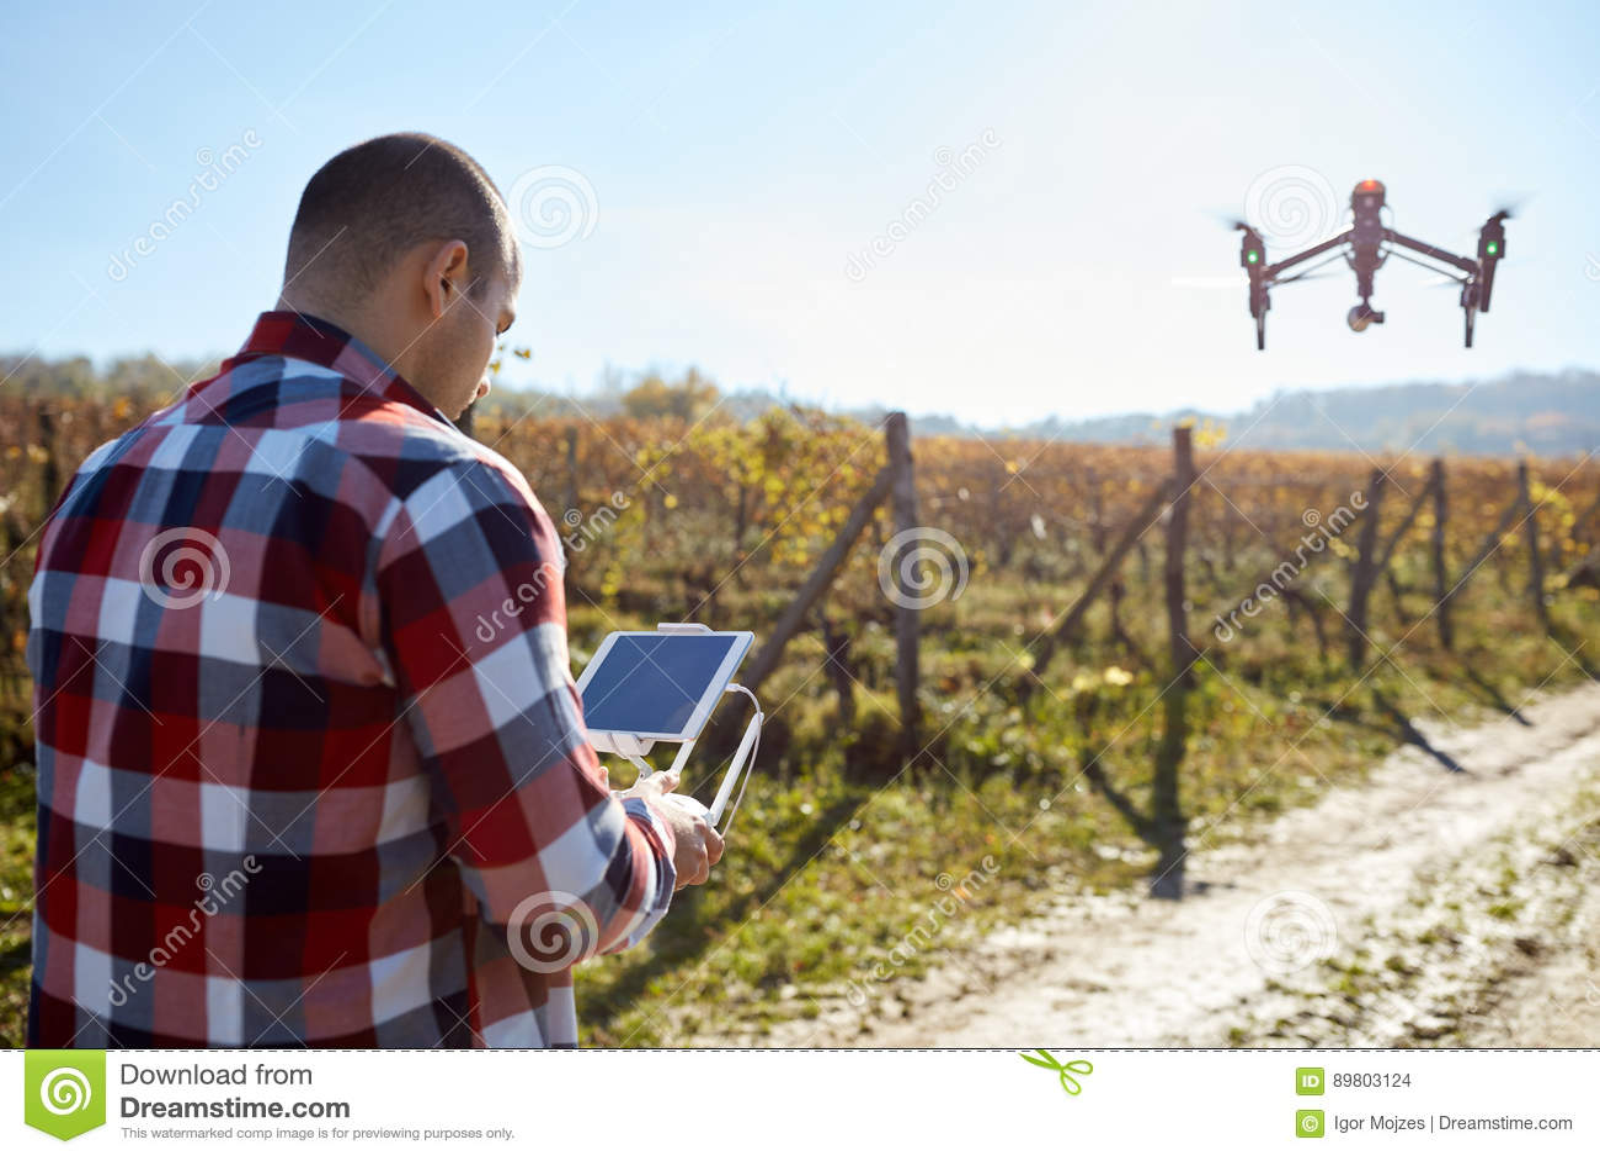 Man remote control flying drone